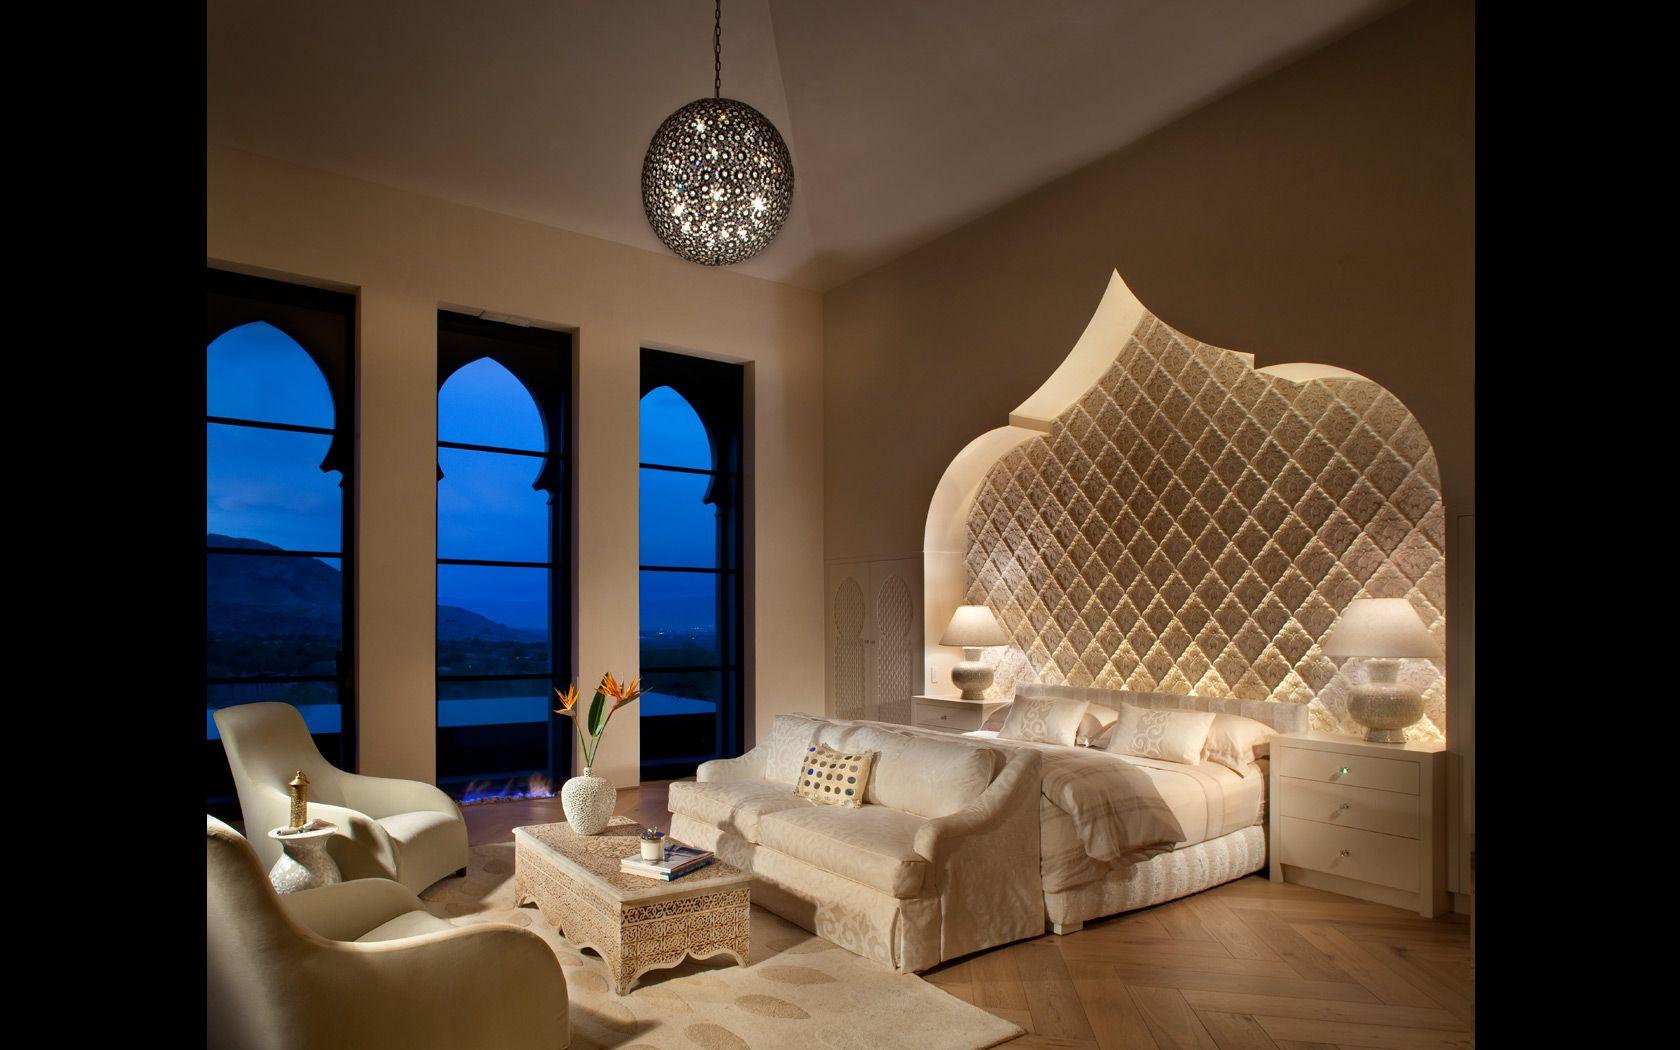 Ultimate moroccan design in Palm desert - Casbah Cove ...